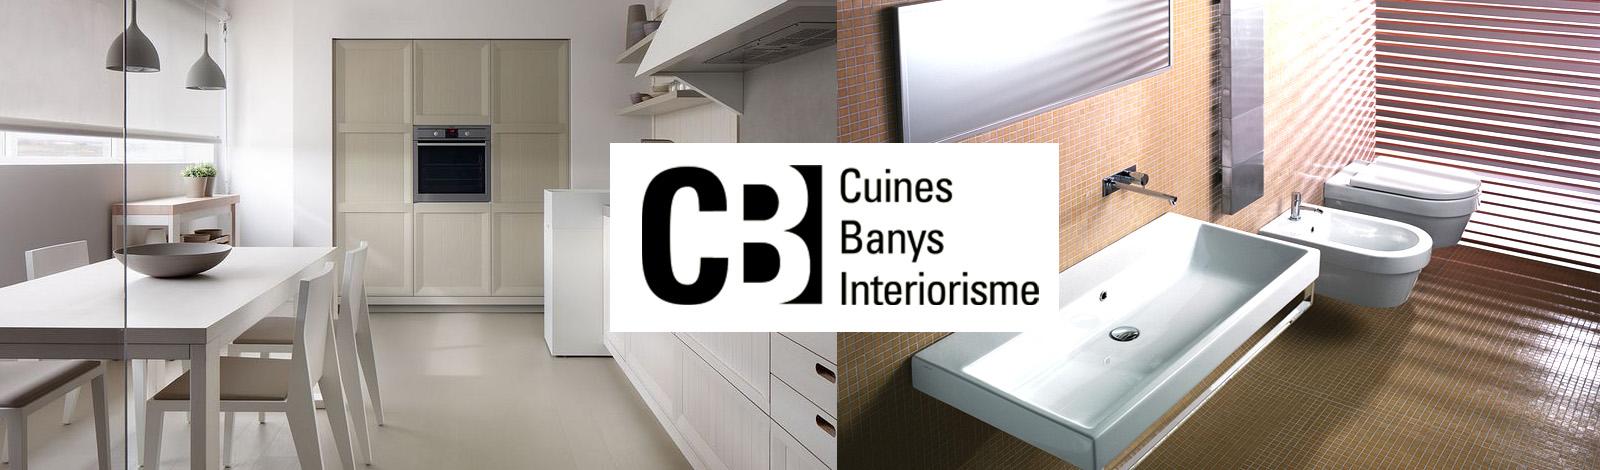 slider-cuinesibanys01bc